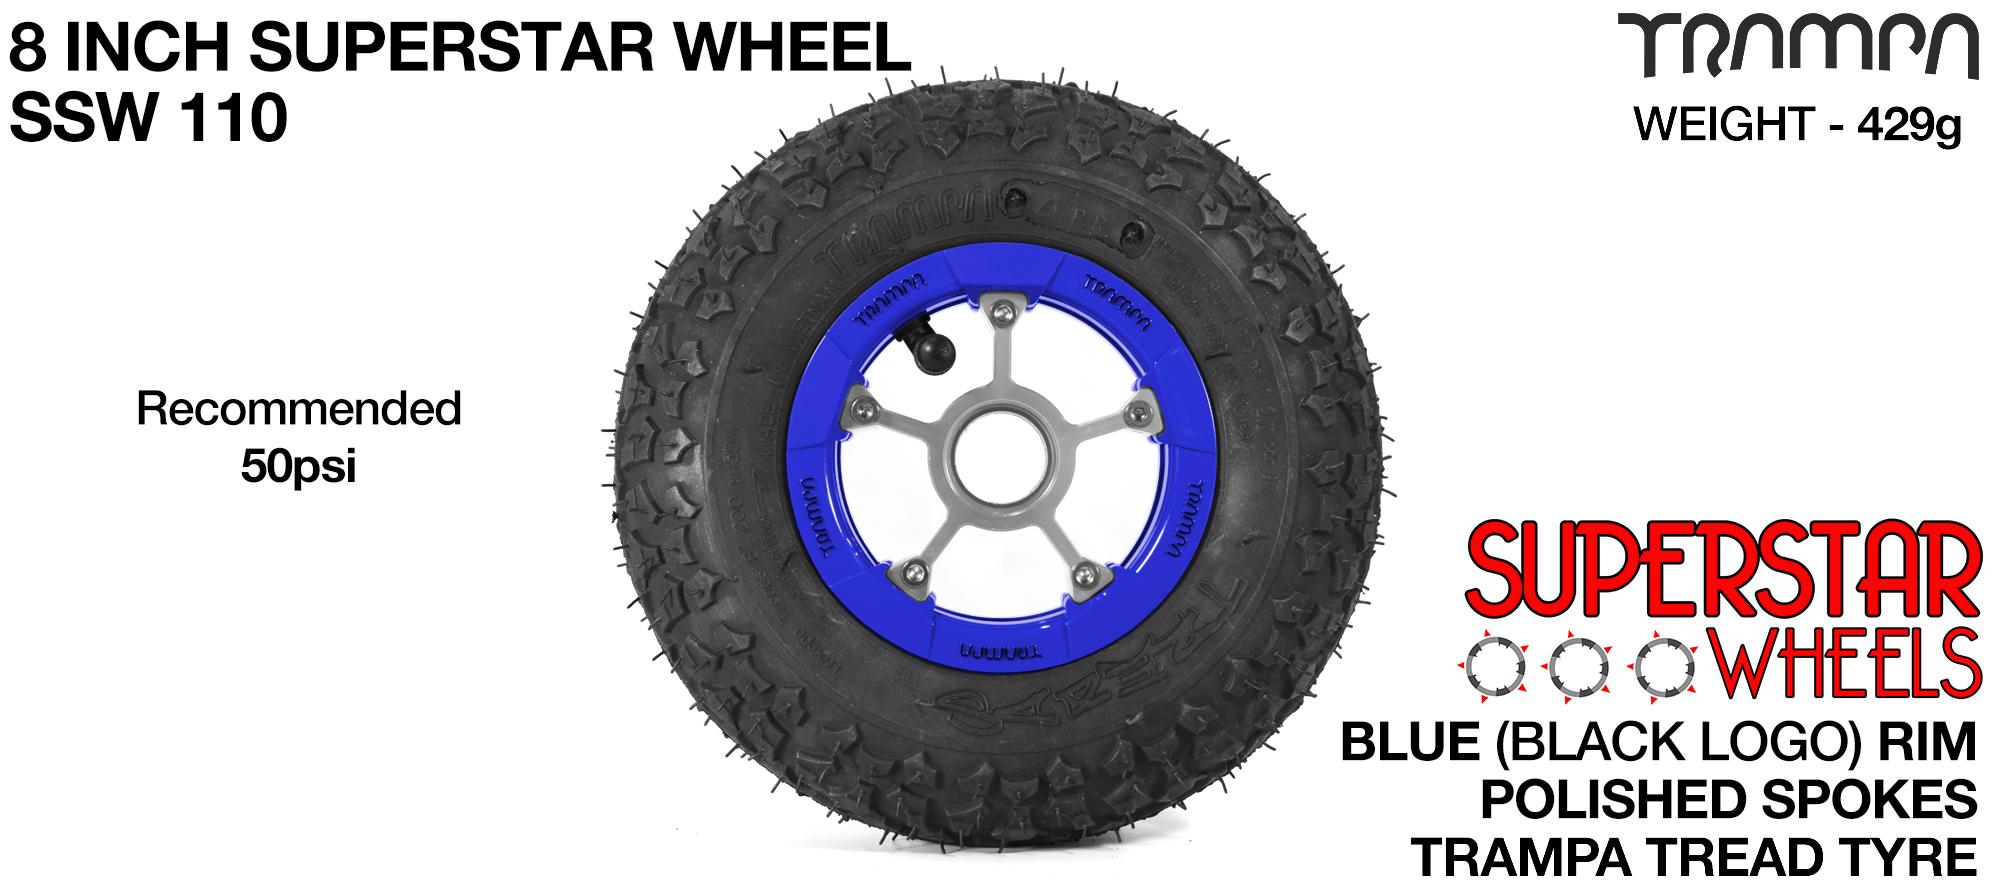 Superstar 8 inch wheels -  Blue & Black Logo Rim Silver Anodised spokes & TRAMPA TREAD 8 inch Tyre